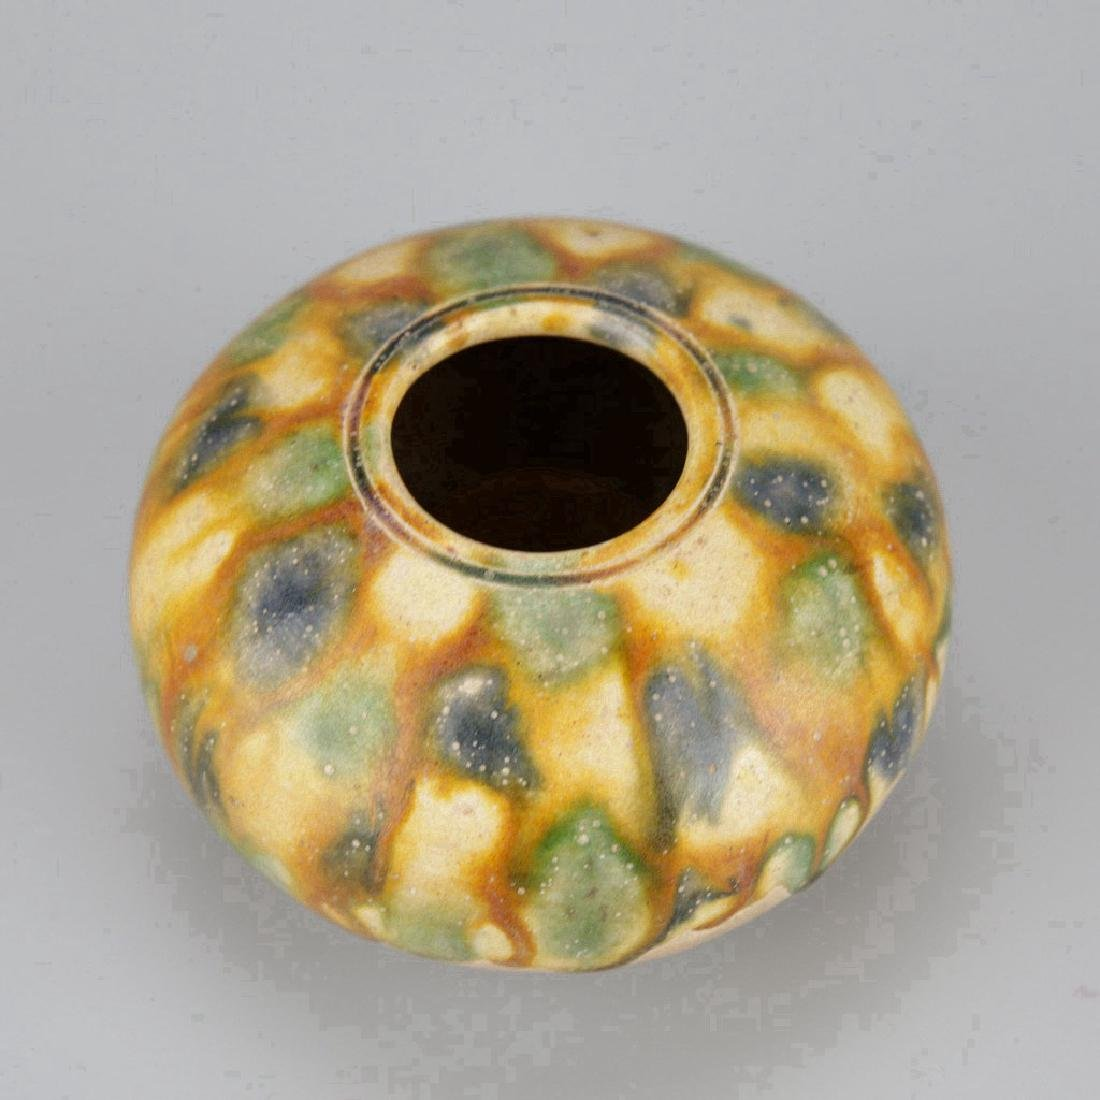 Chinese Tangsancai Pottery Water Pot - 3